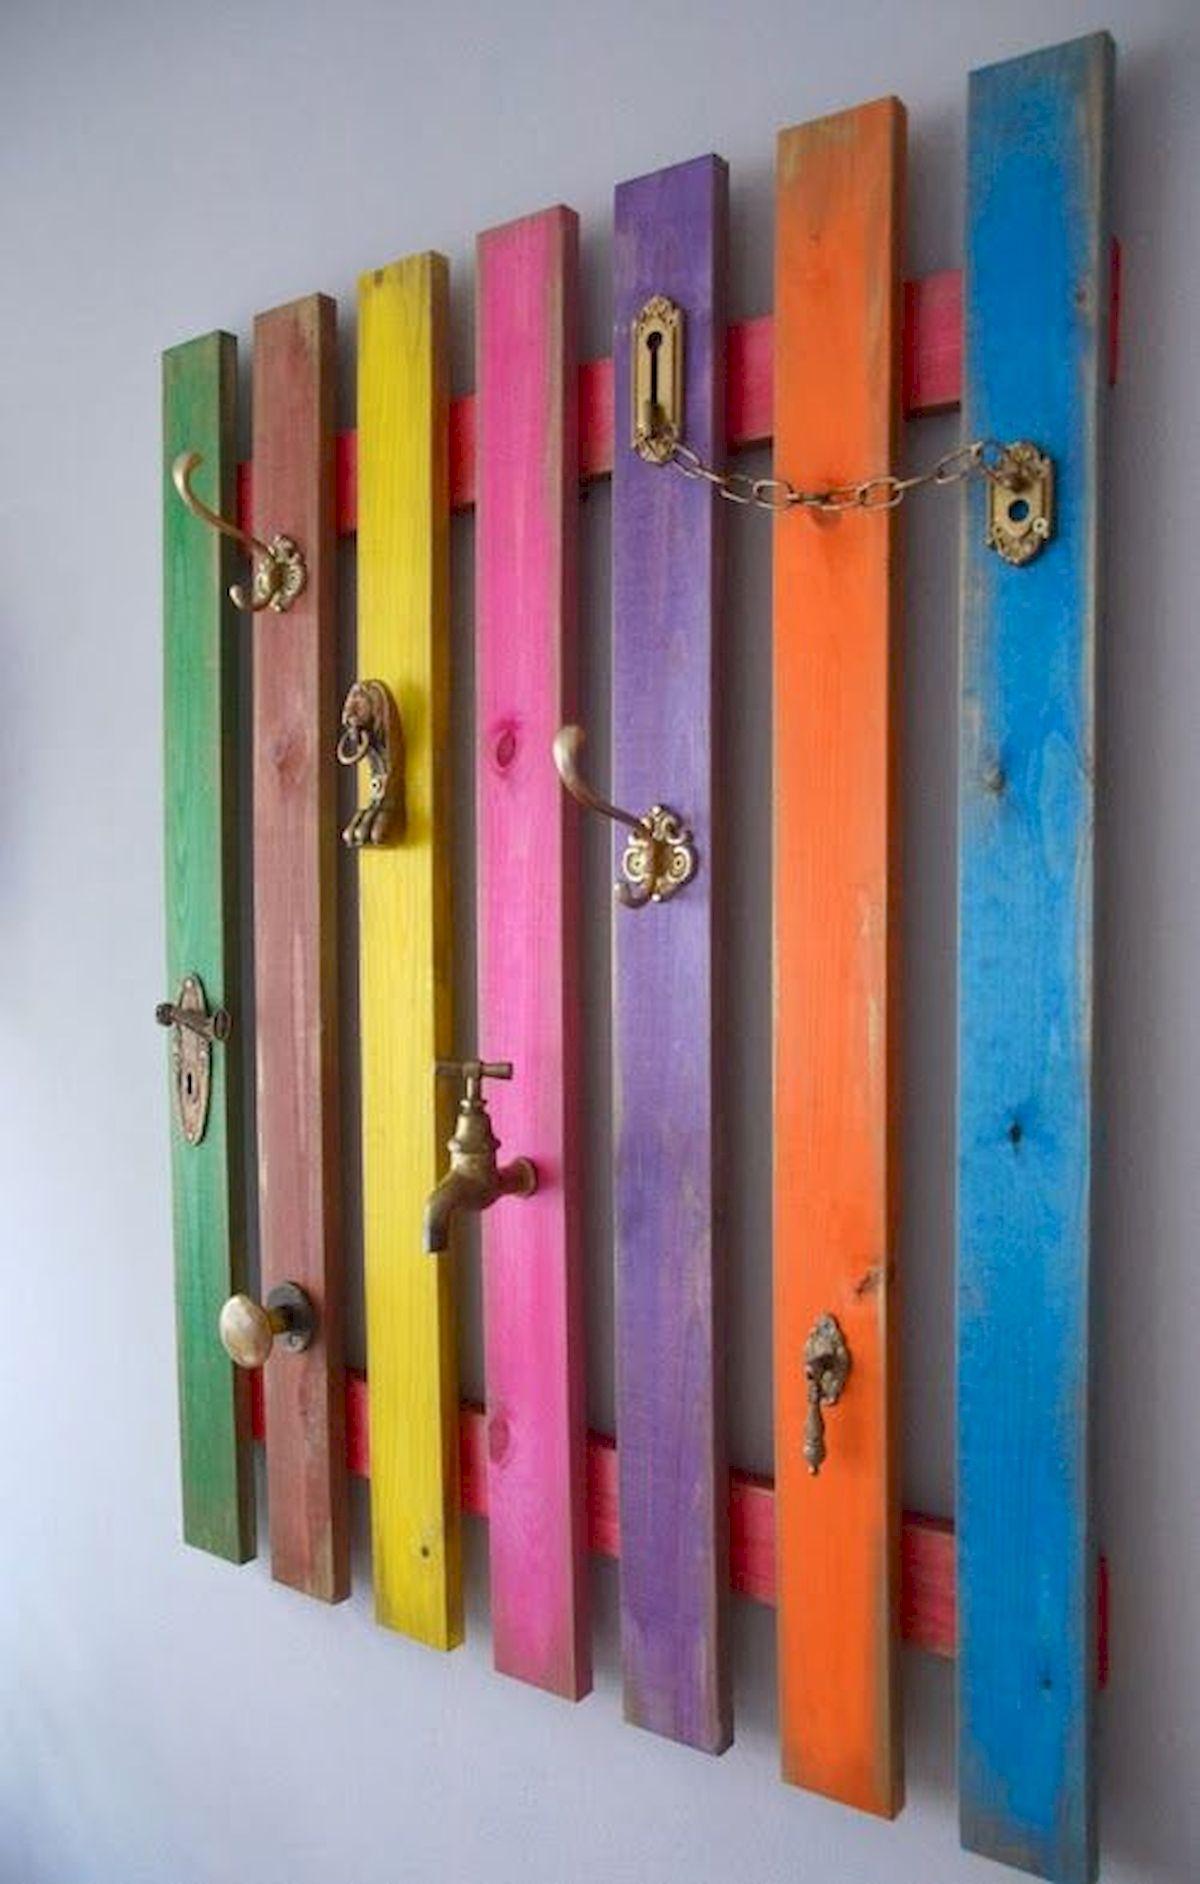 30 Fantastic DIY Hanger Ideas From Wooden Pallets (2)